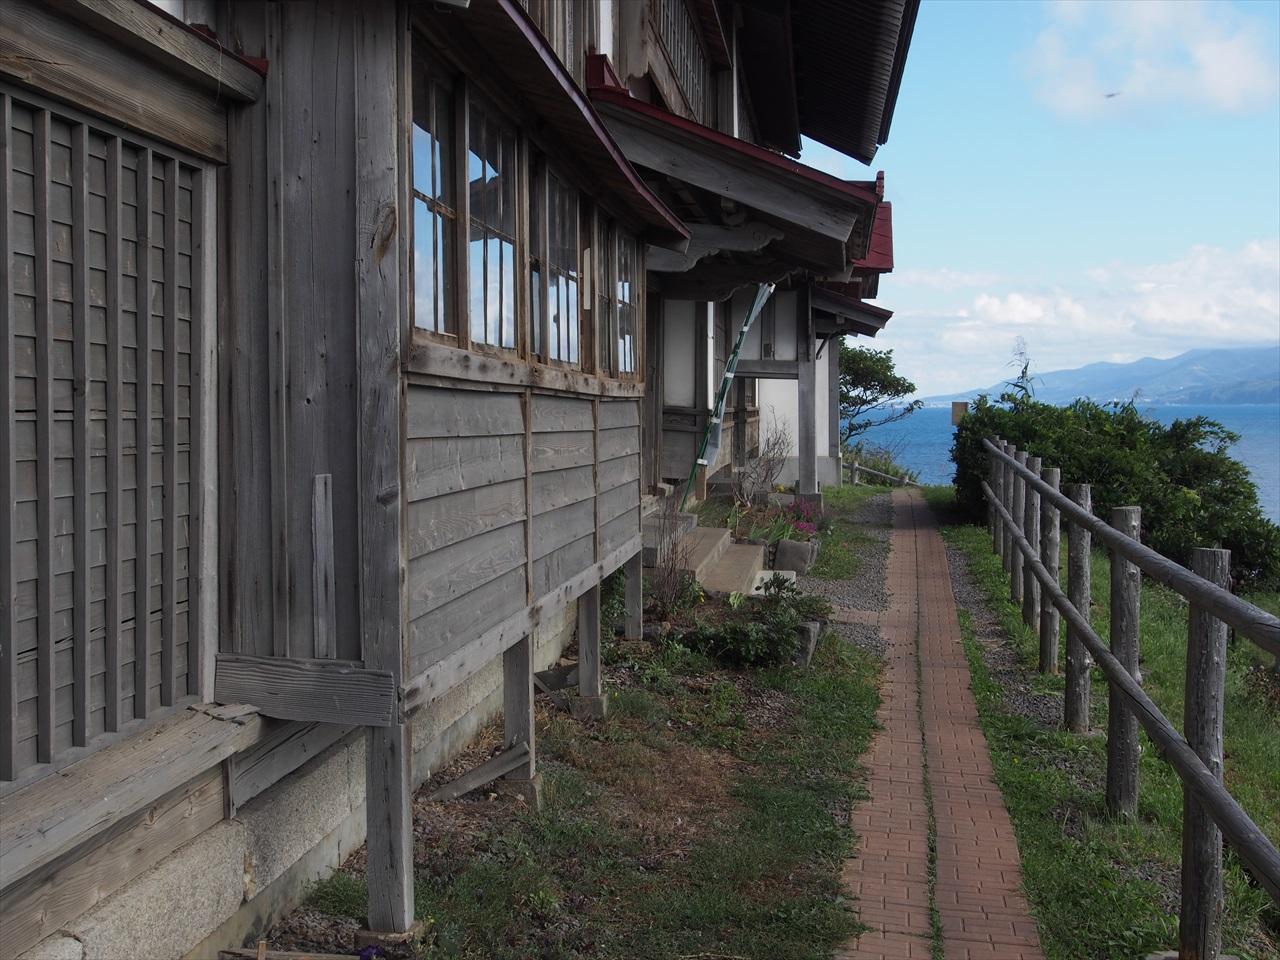 小樽市鰊御殿の入り口通路